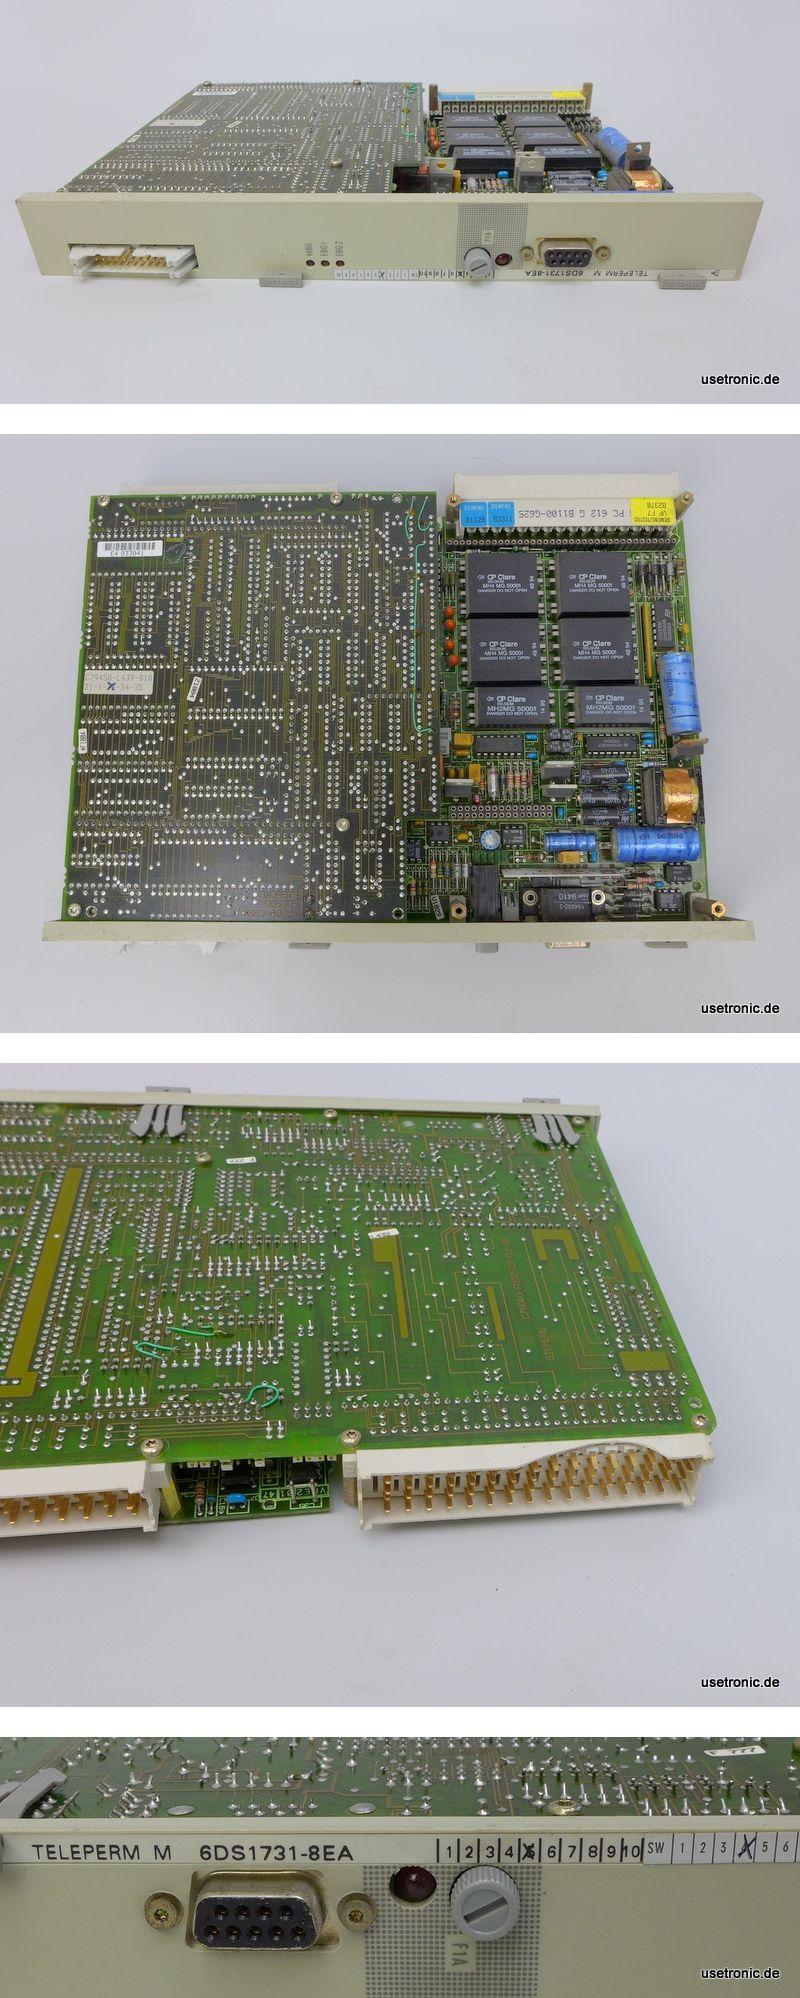 Siemens Teleperm 6DS1731-8EA 6DS 1731-8EA E:4